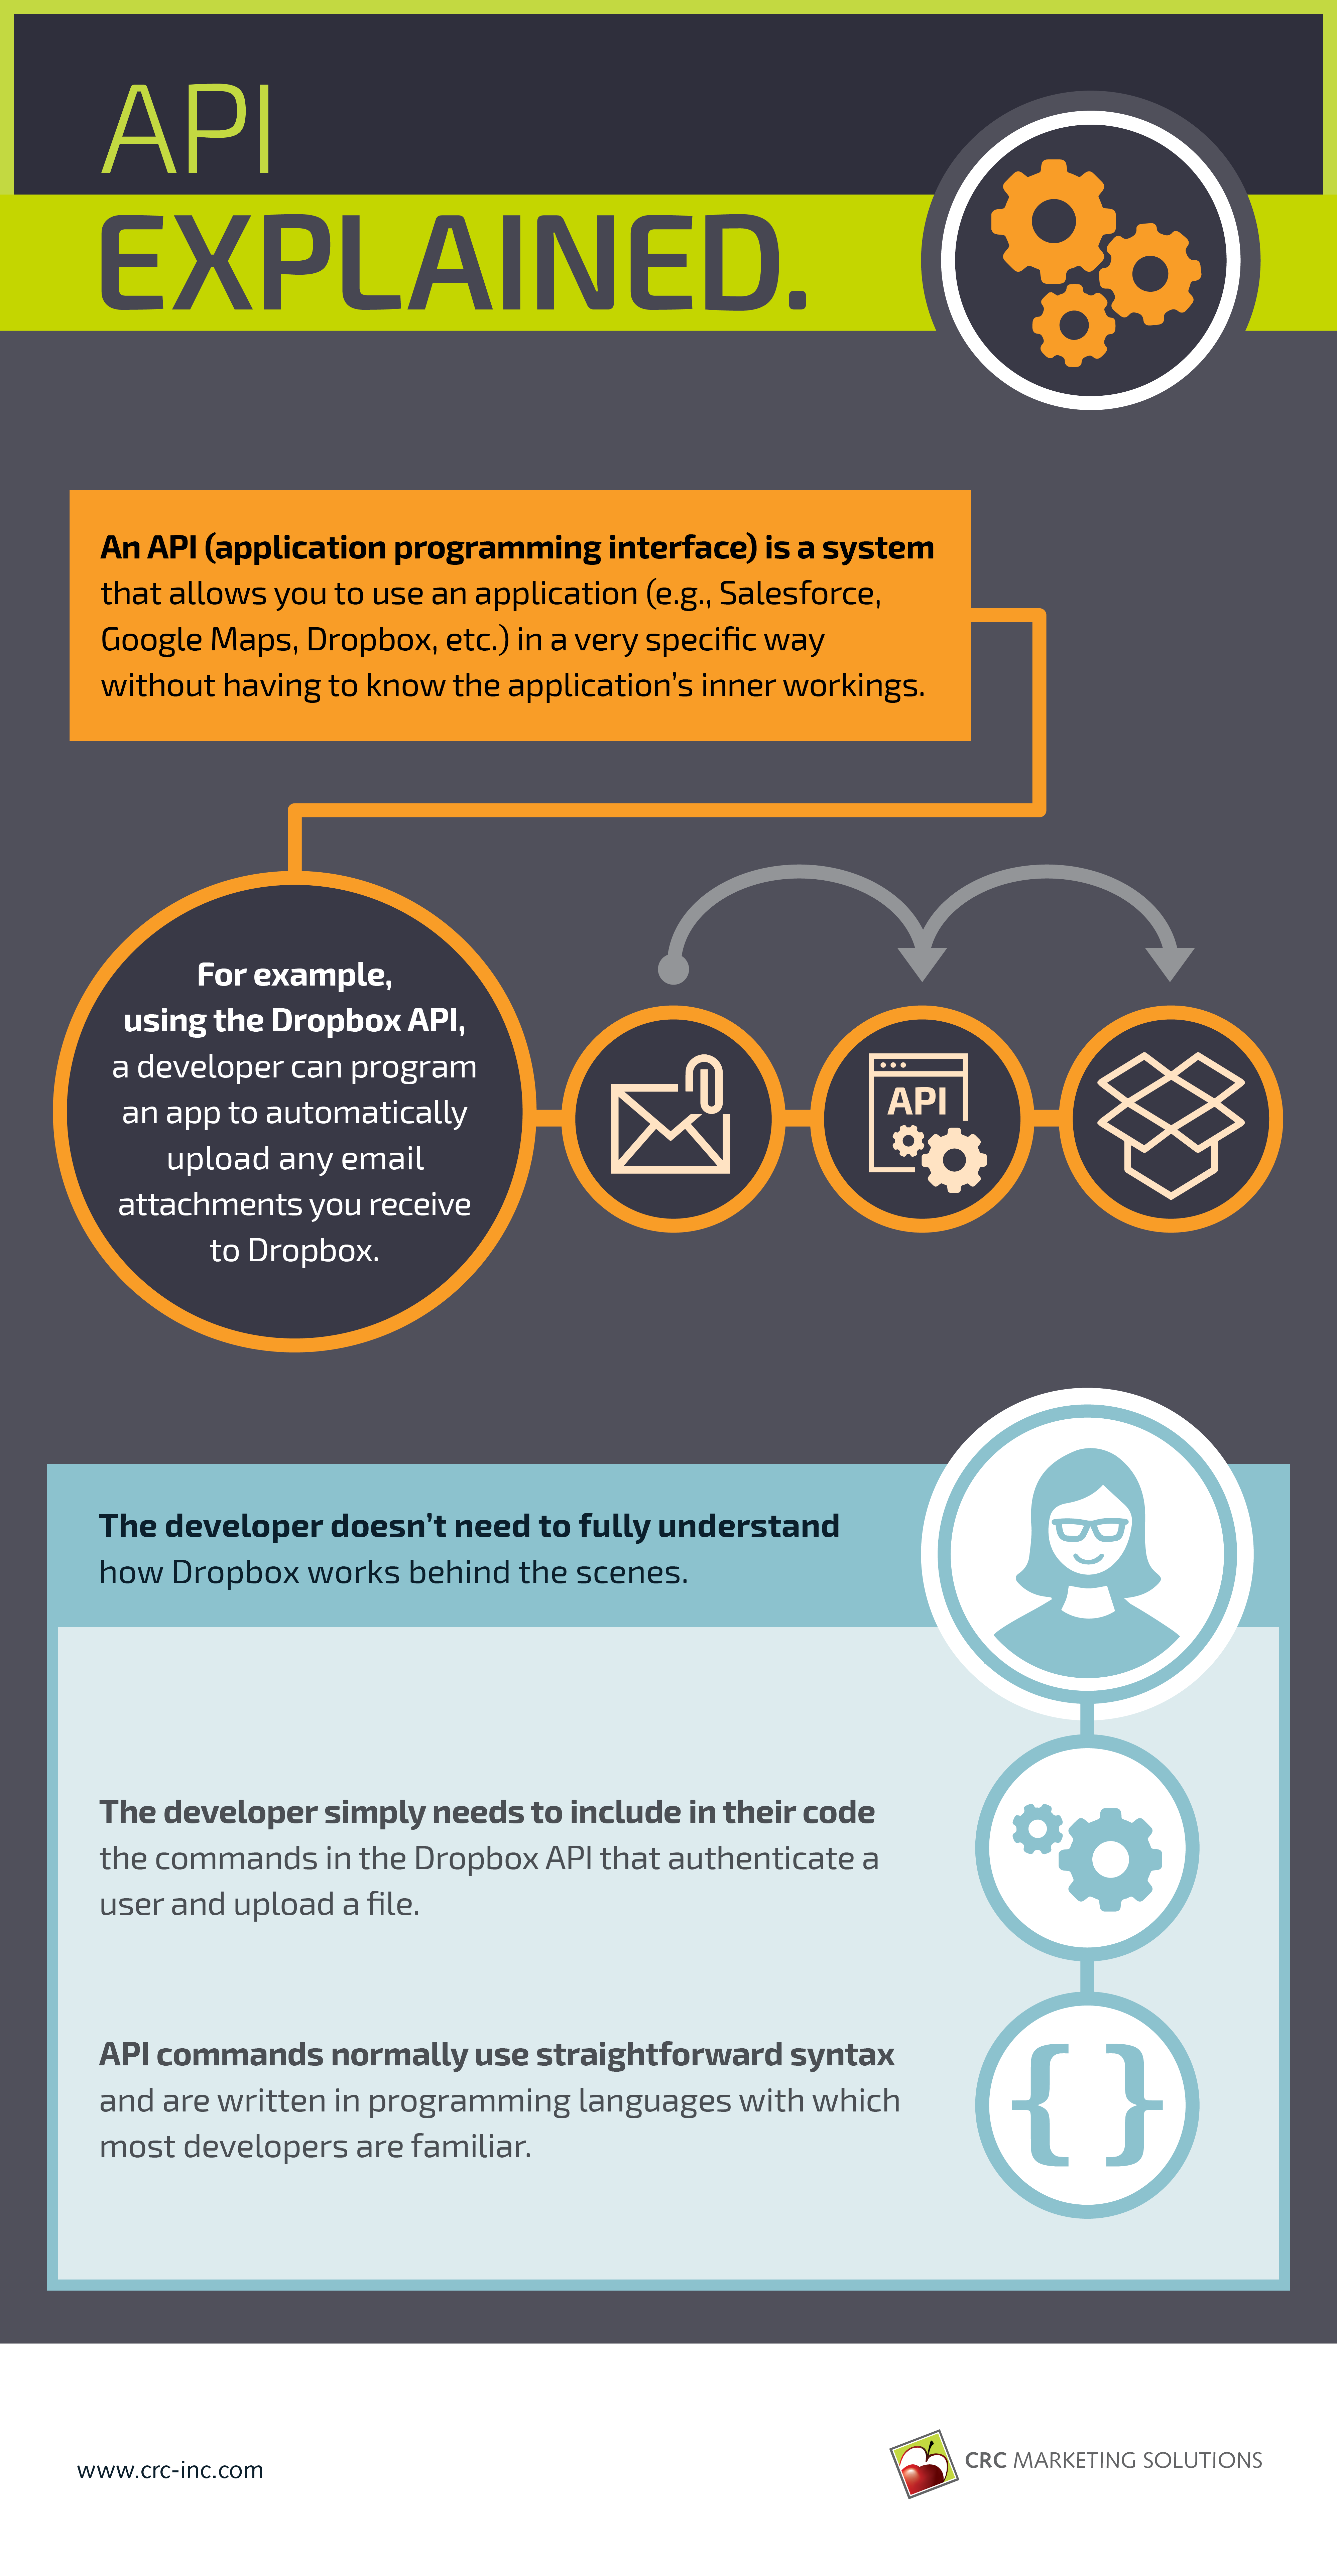 API explained Infographic